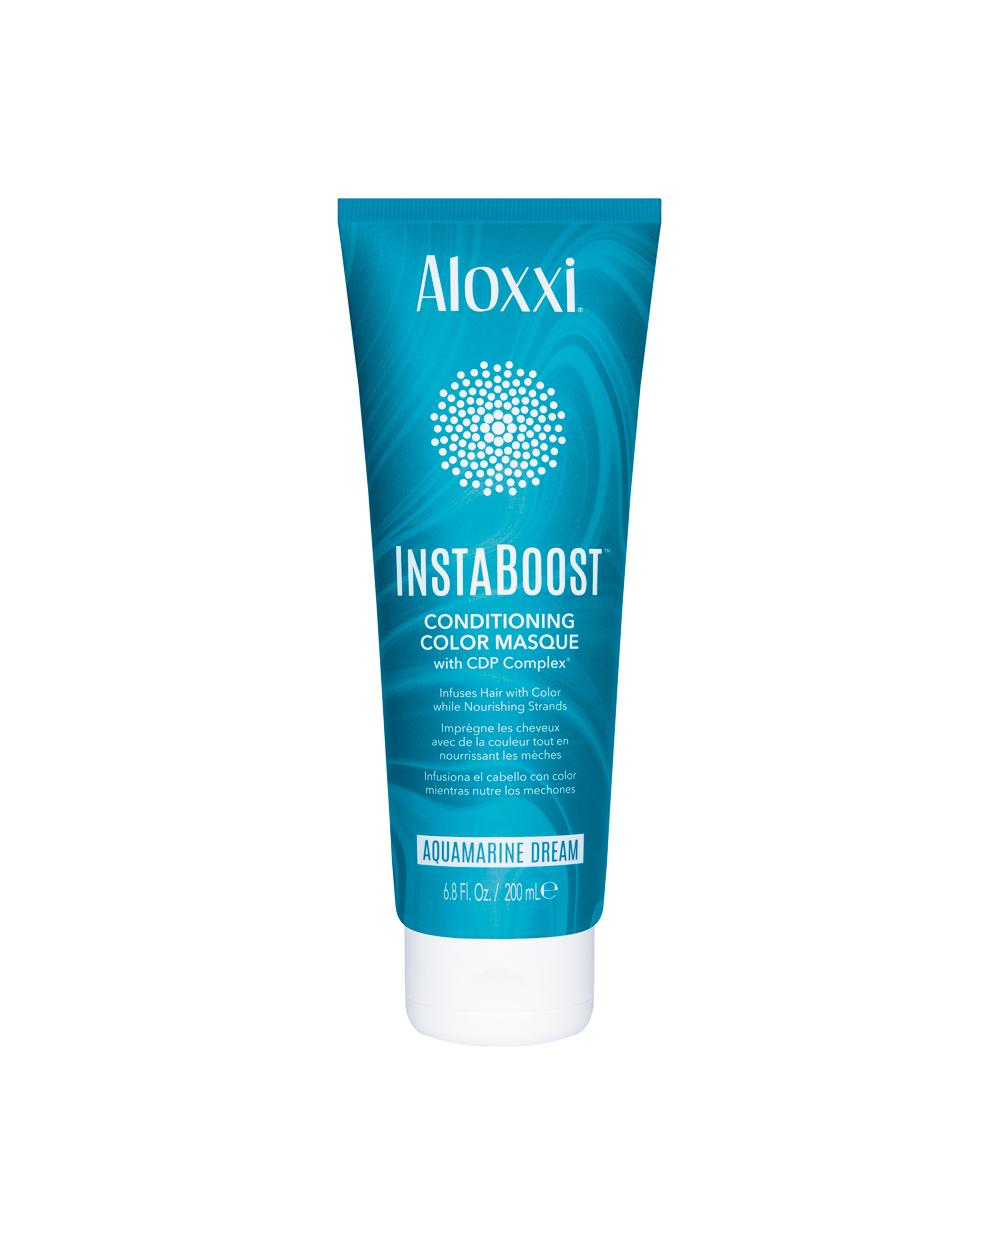 Aloxxi-Master-Aquamarine-Dream.jpg